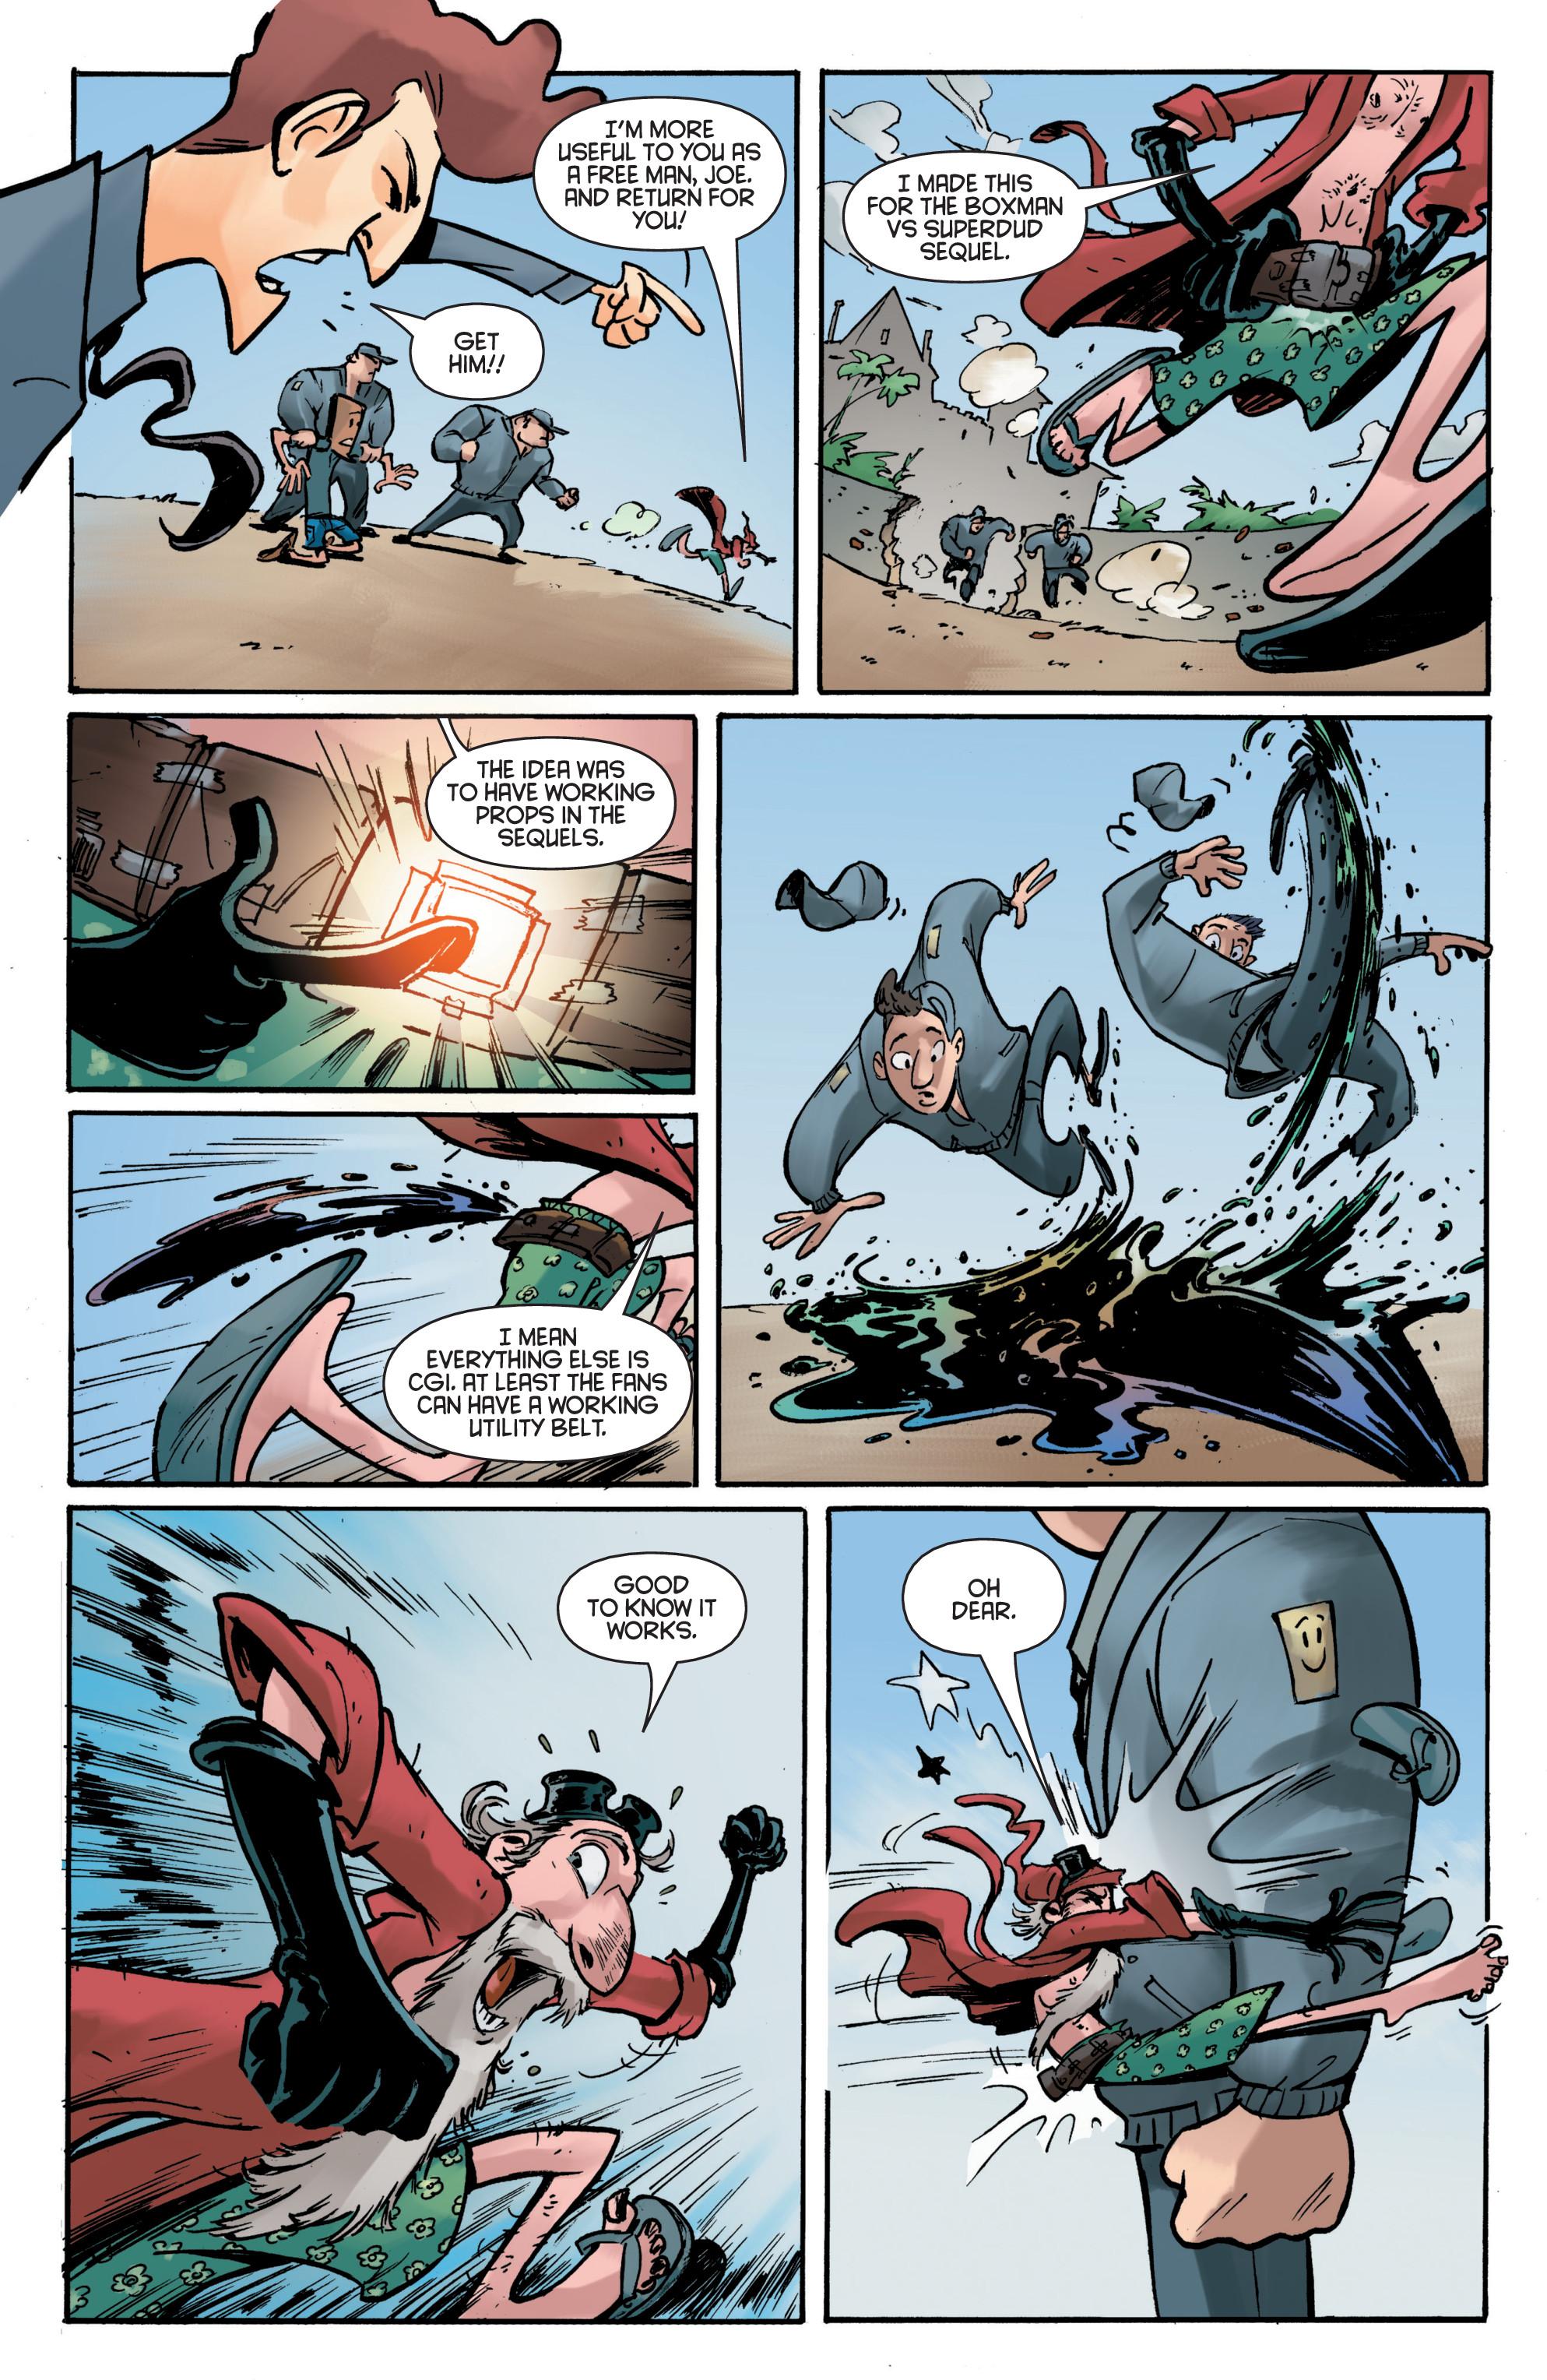 Read online Smosh comic -  Issue #5 - 20